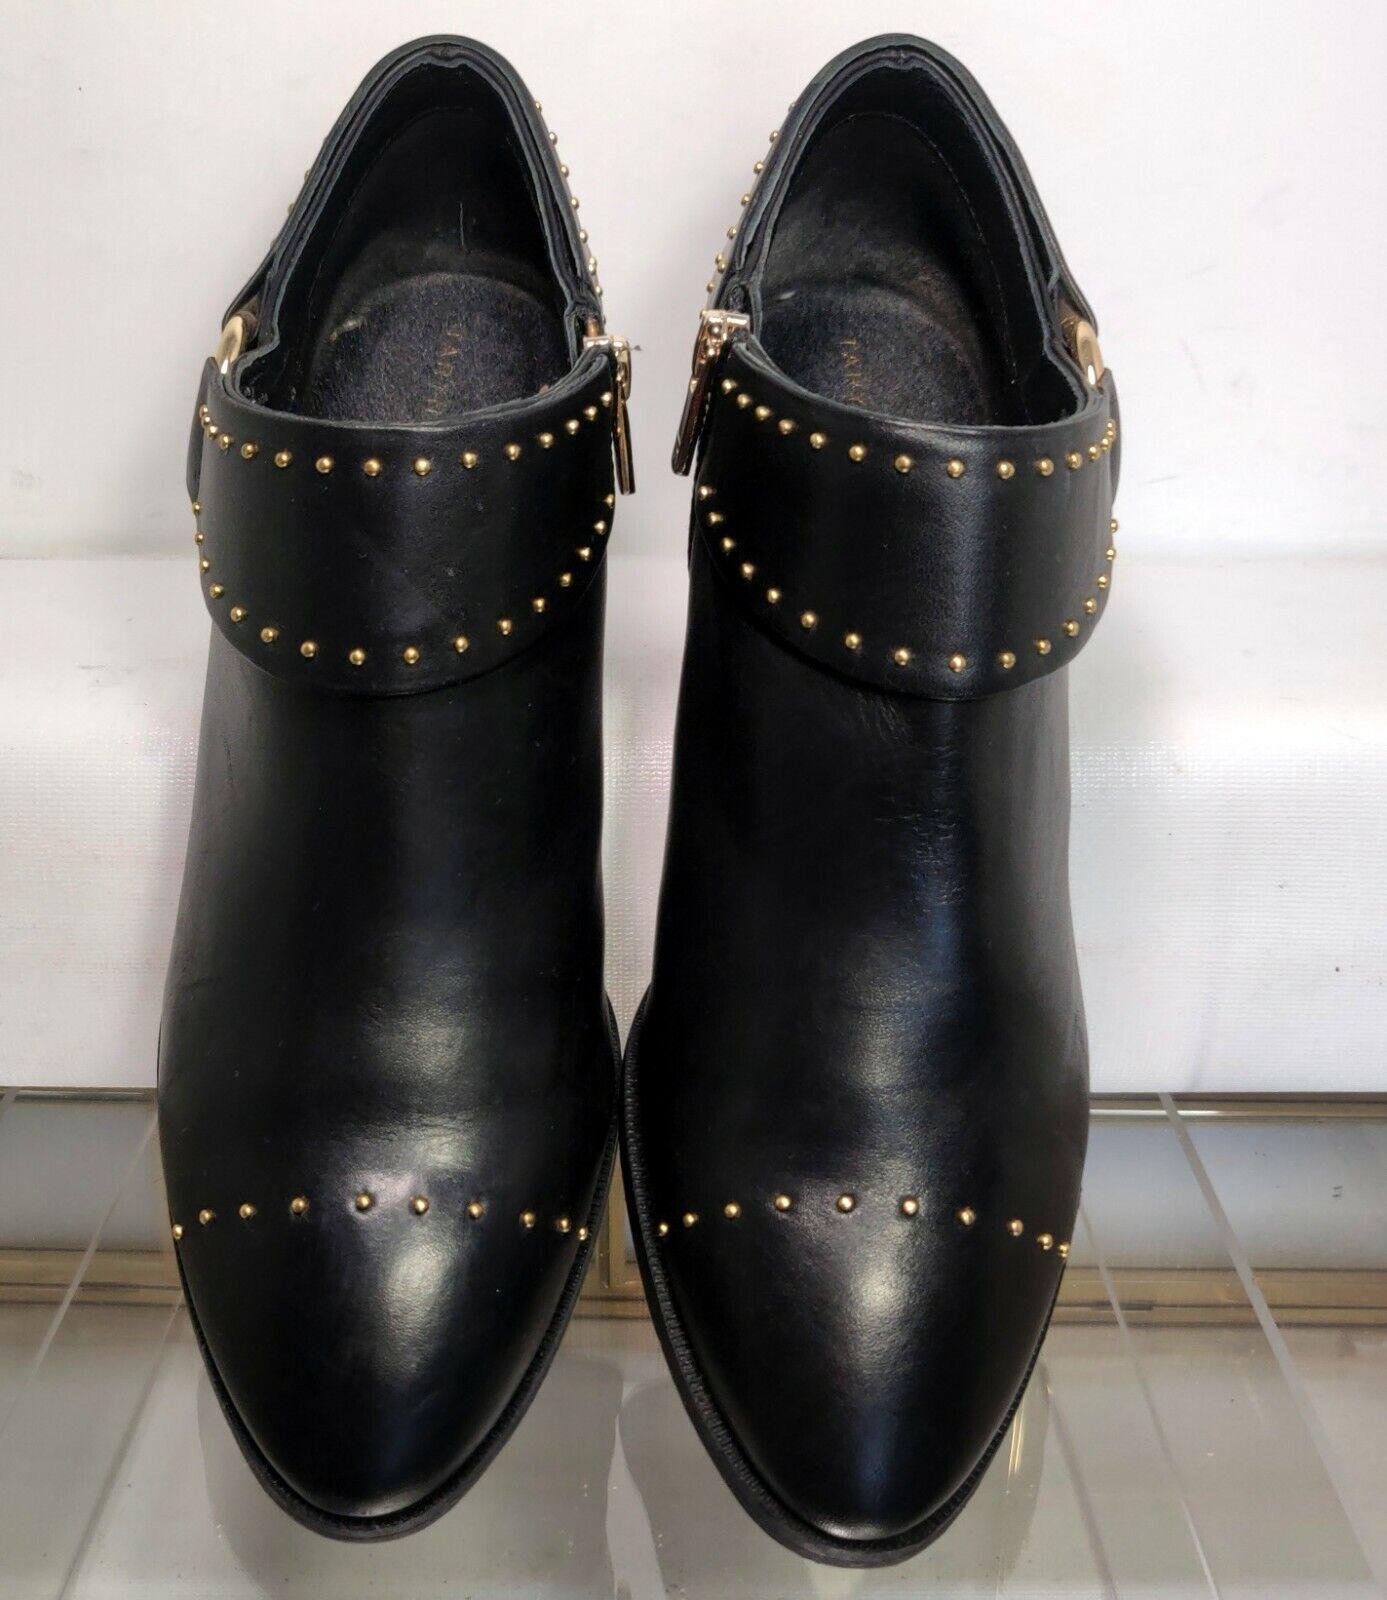 Taryn Rose Sage Black Leather Studded Booties Women US 8.5 Minimal Wear